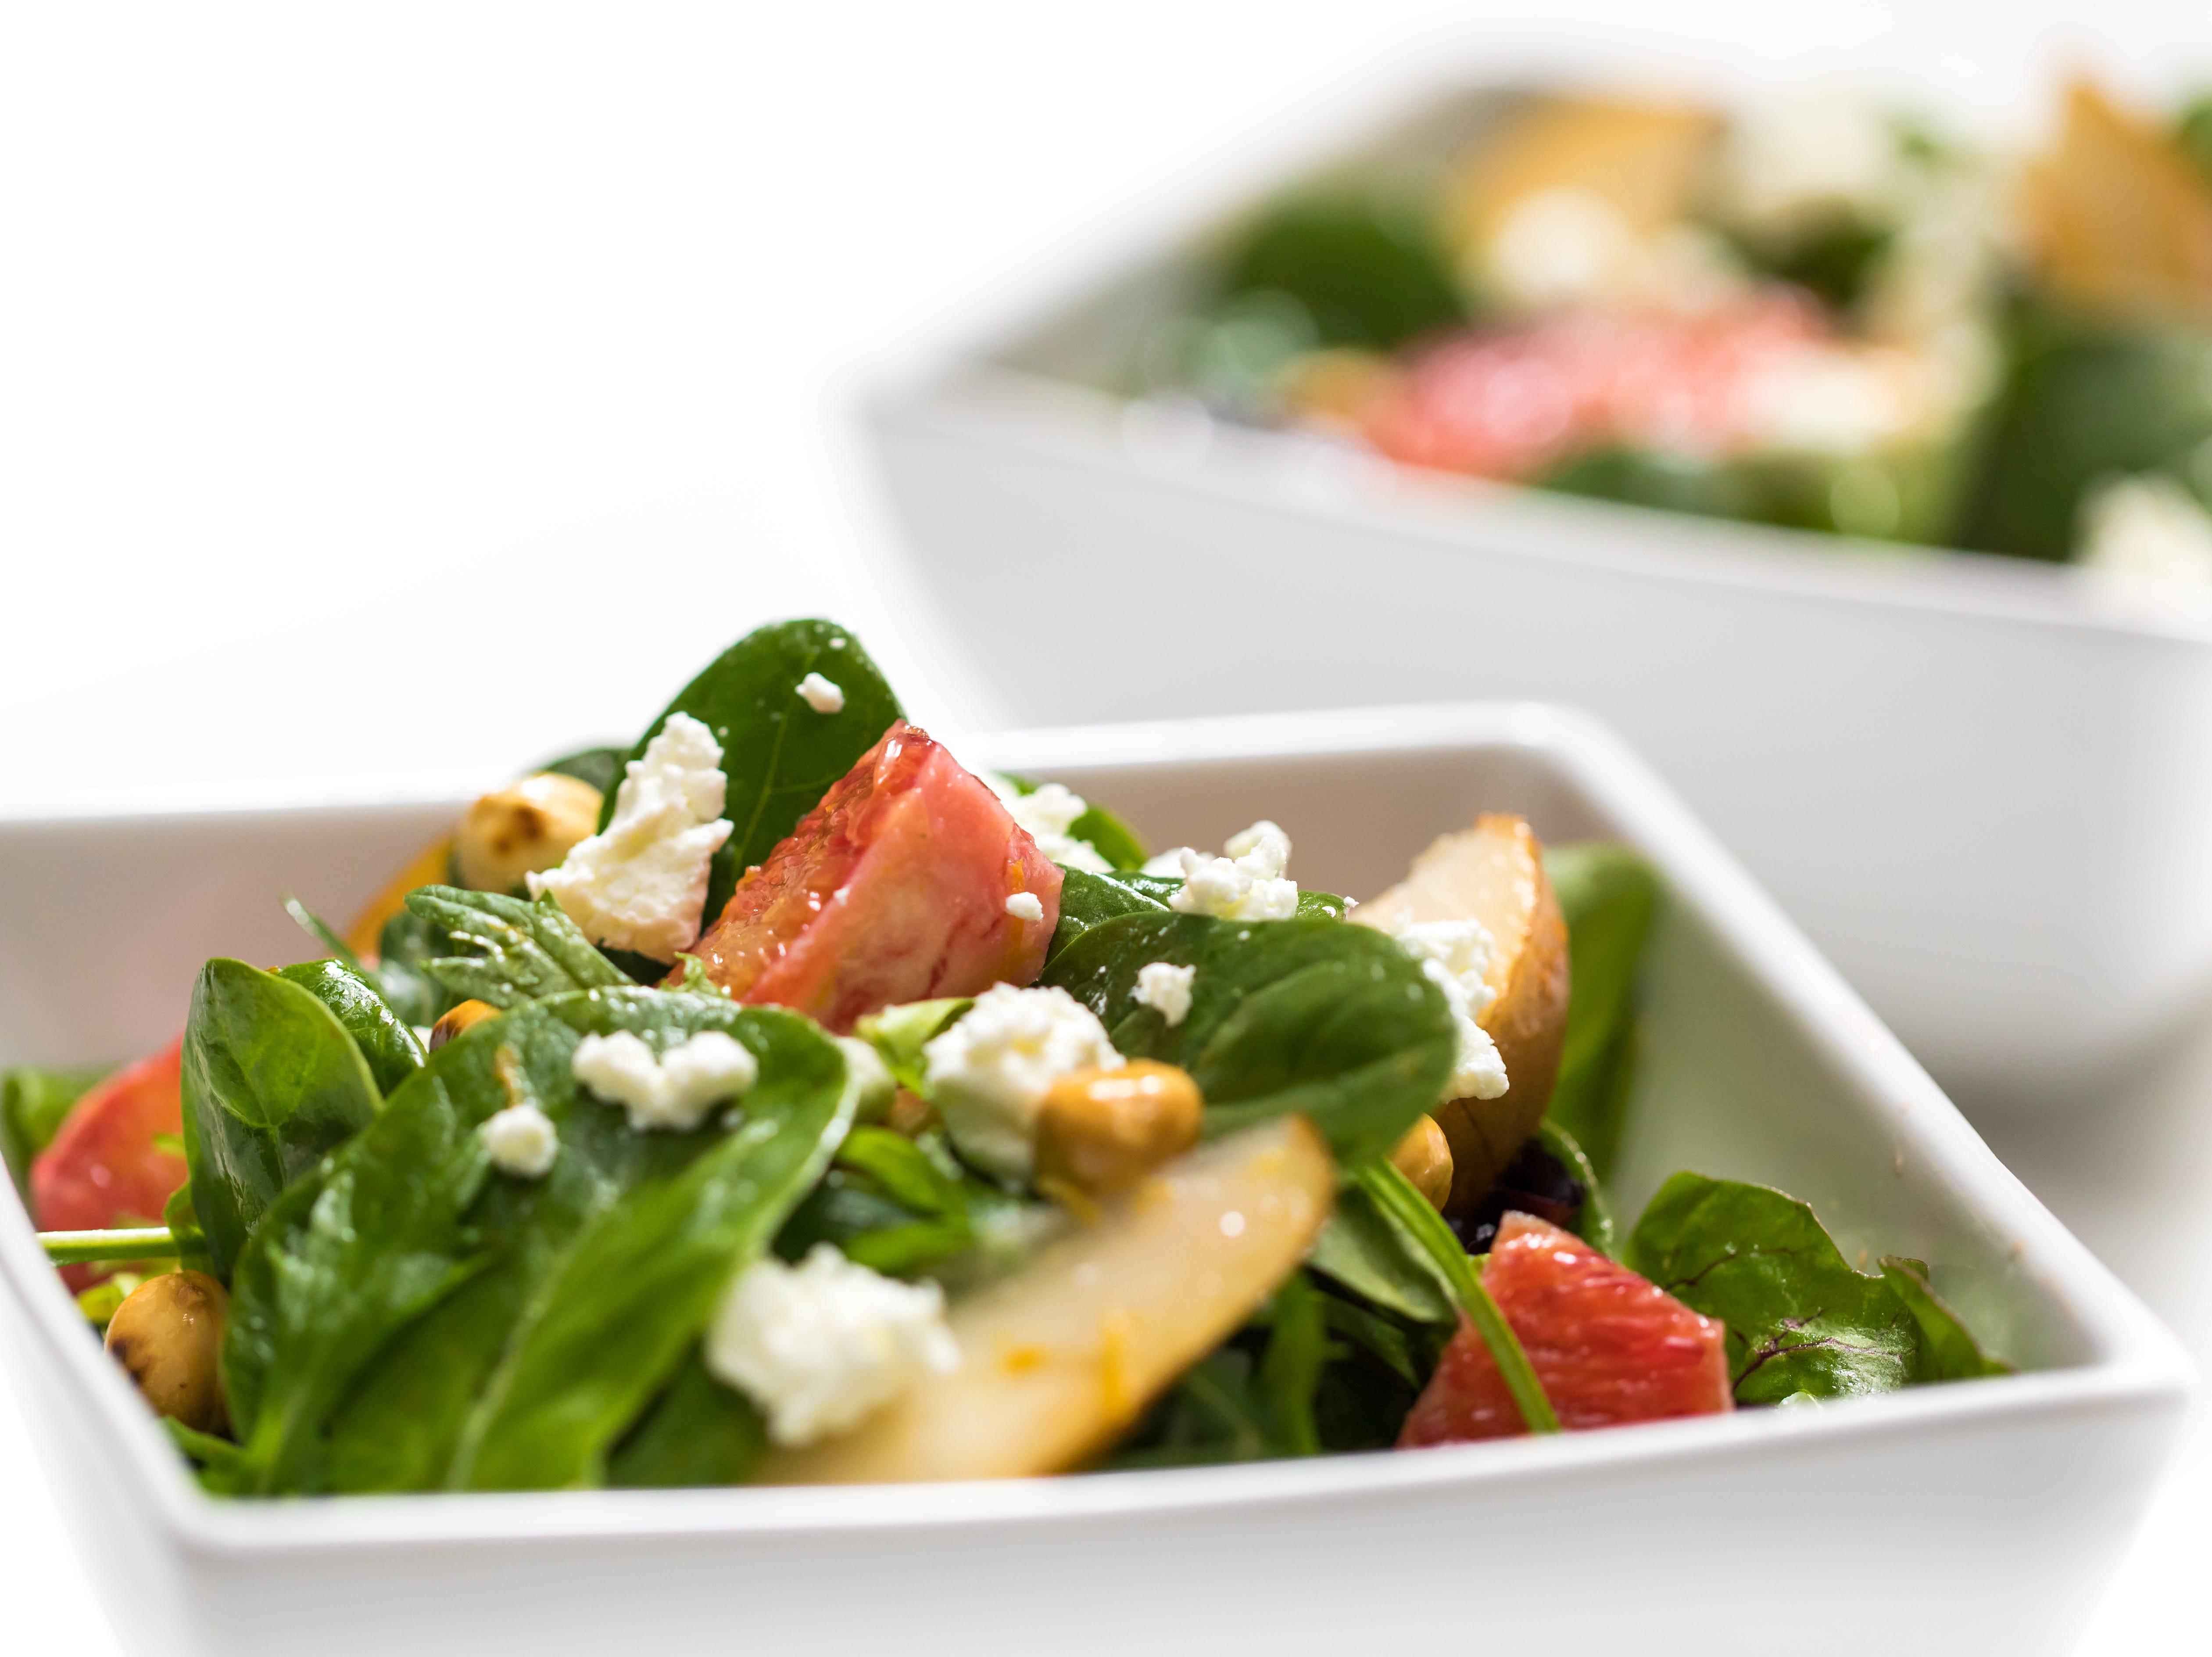 Pear salad with blood orange vinaigrette